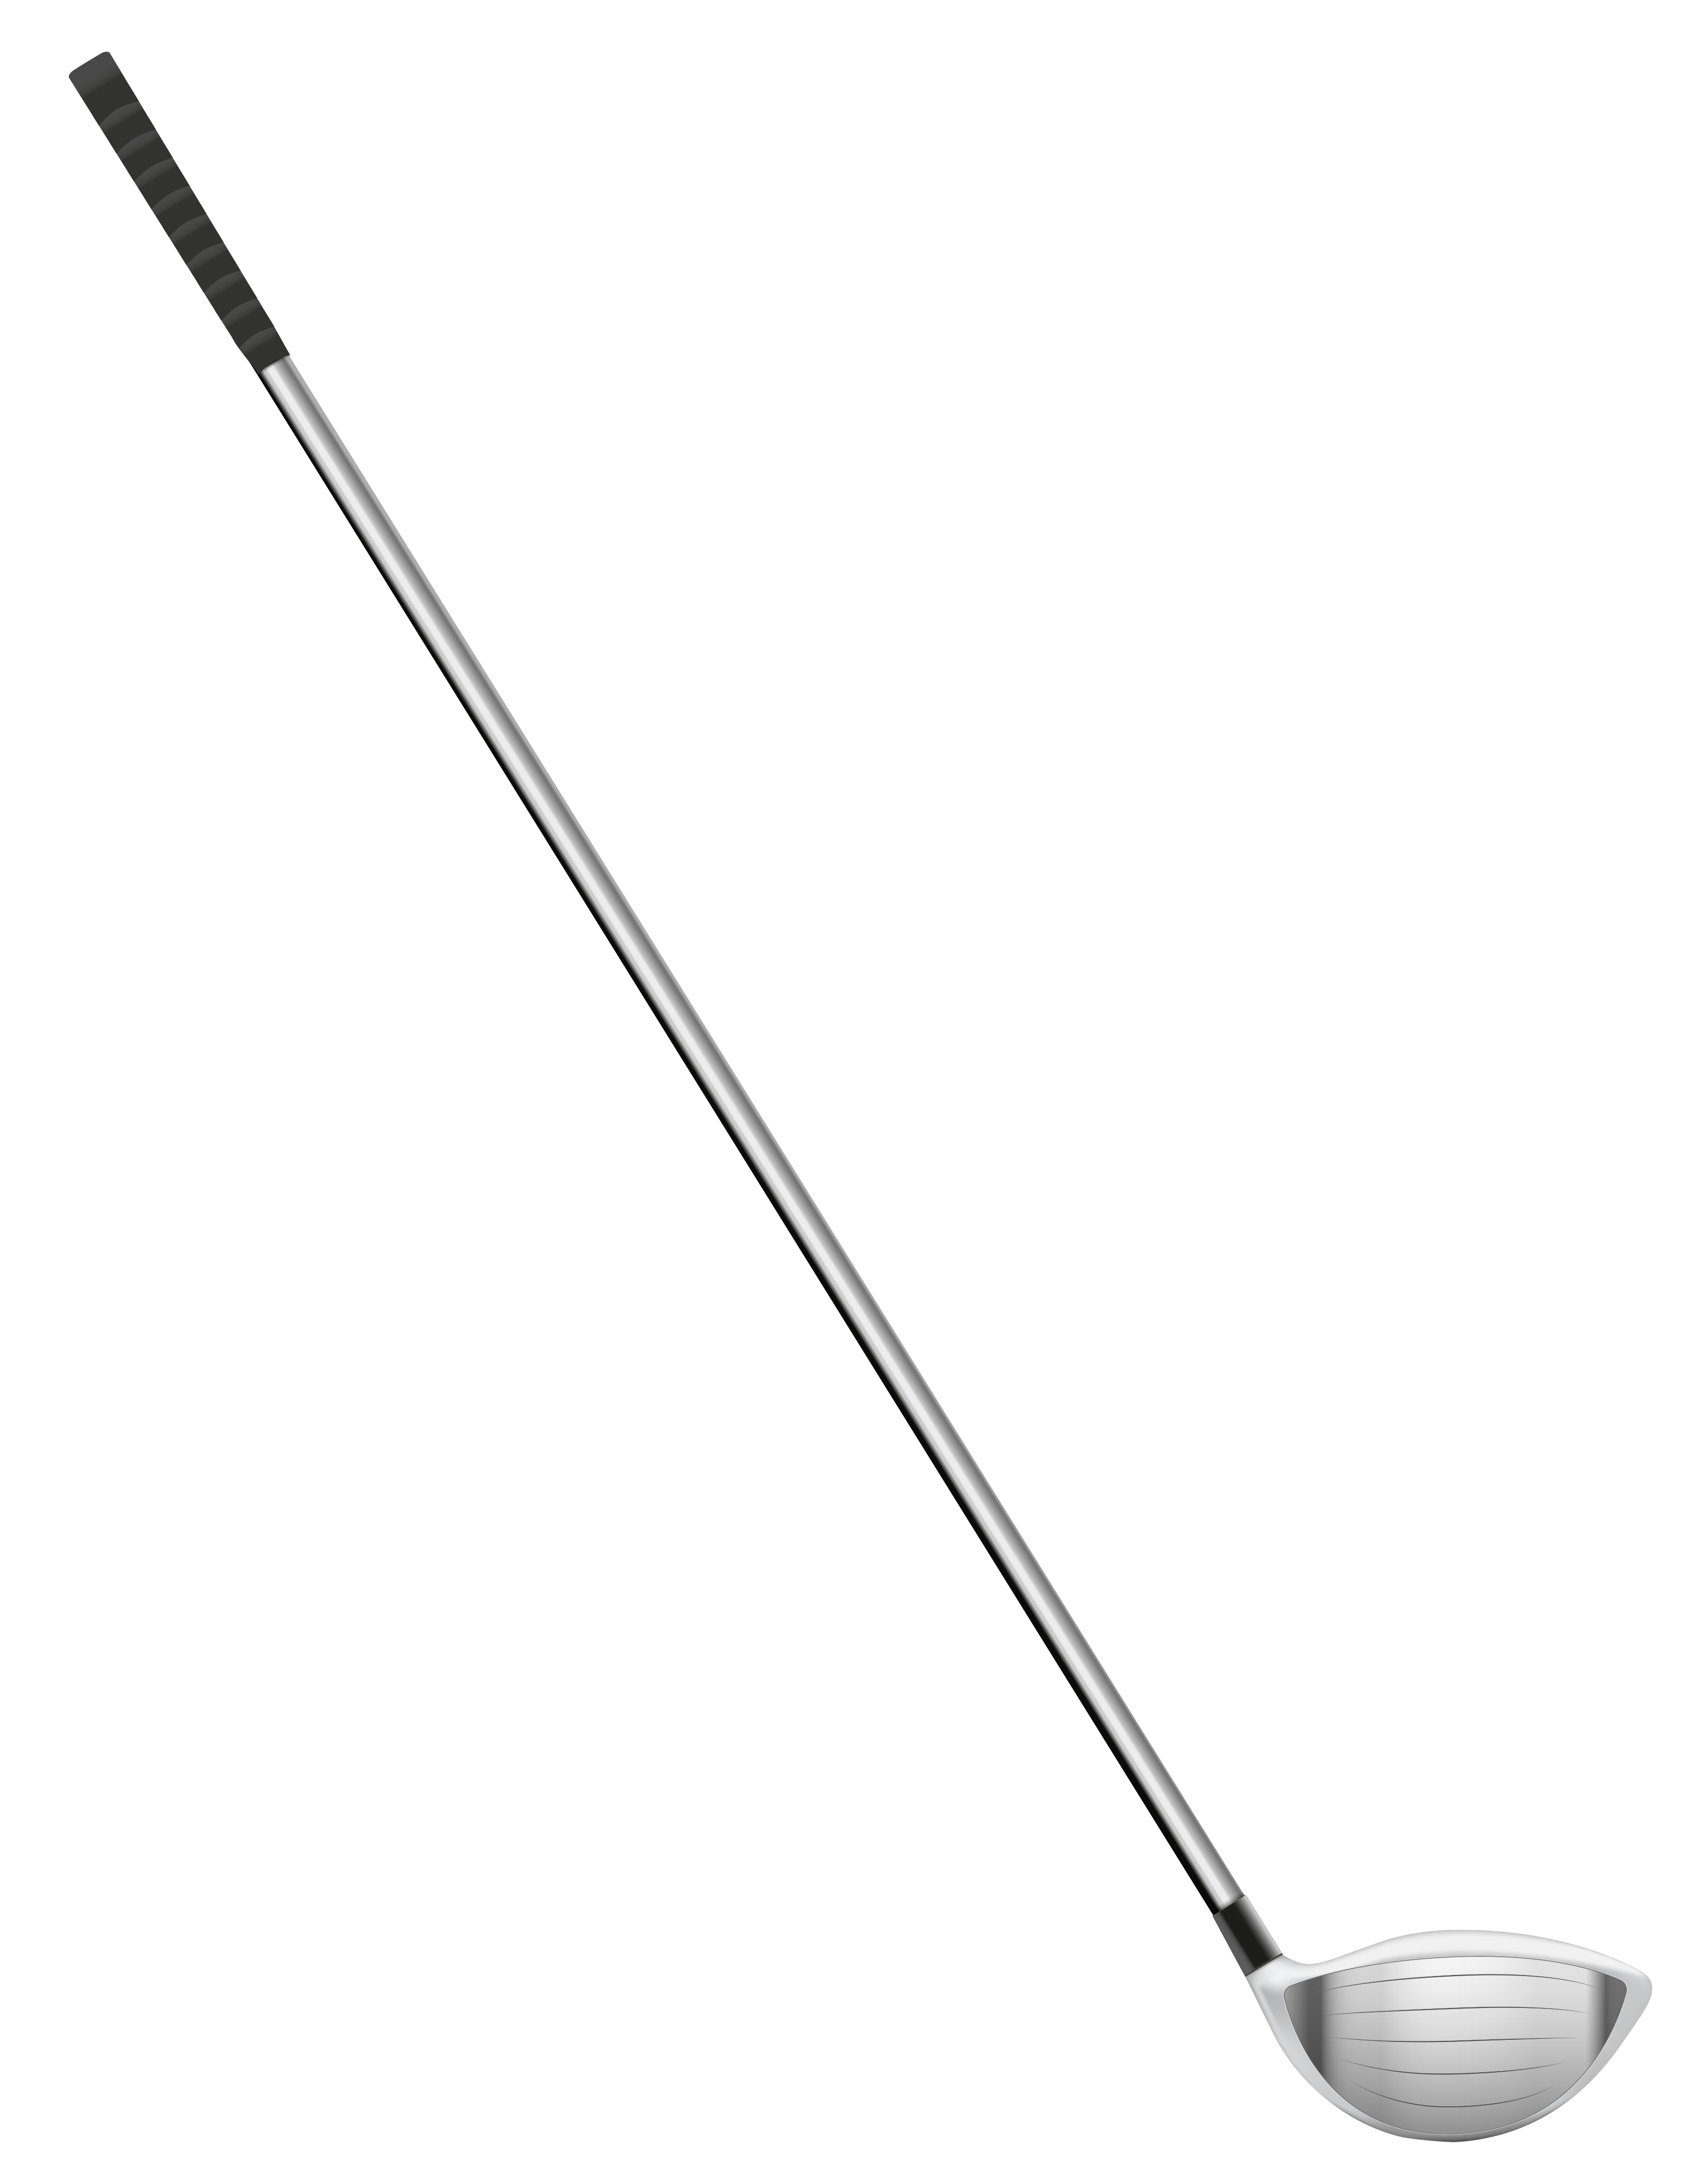 Free Golf Club Cliparts, Download Free Clip Art, Free Clip.